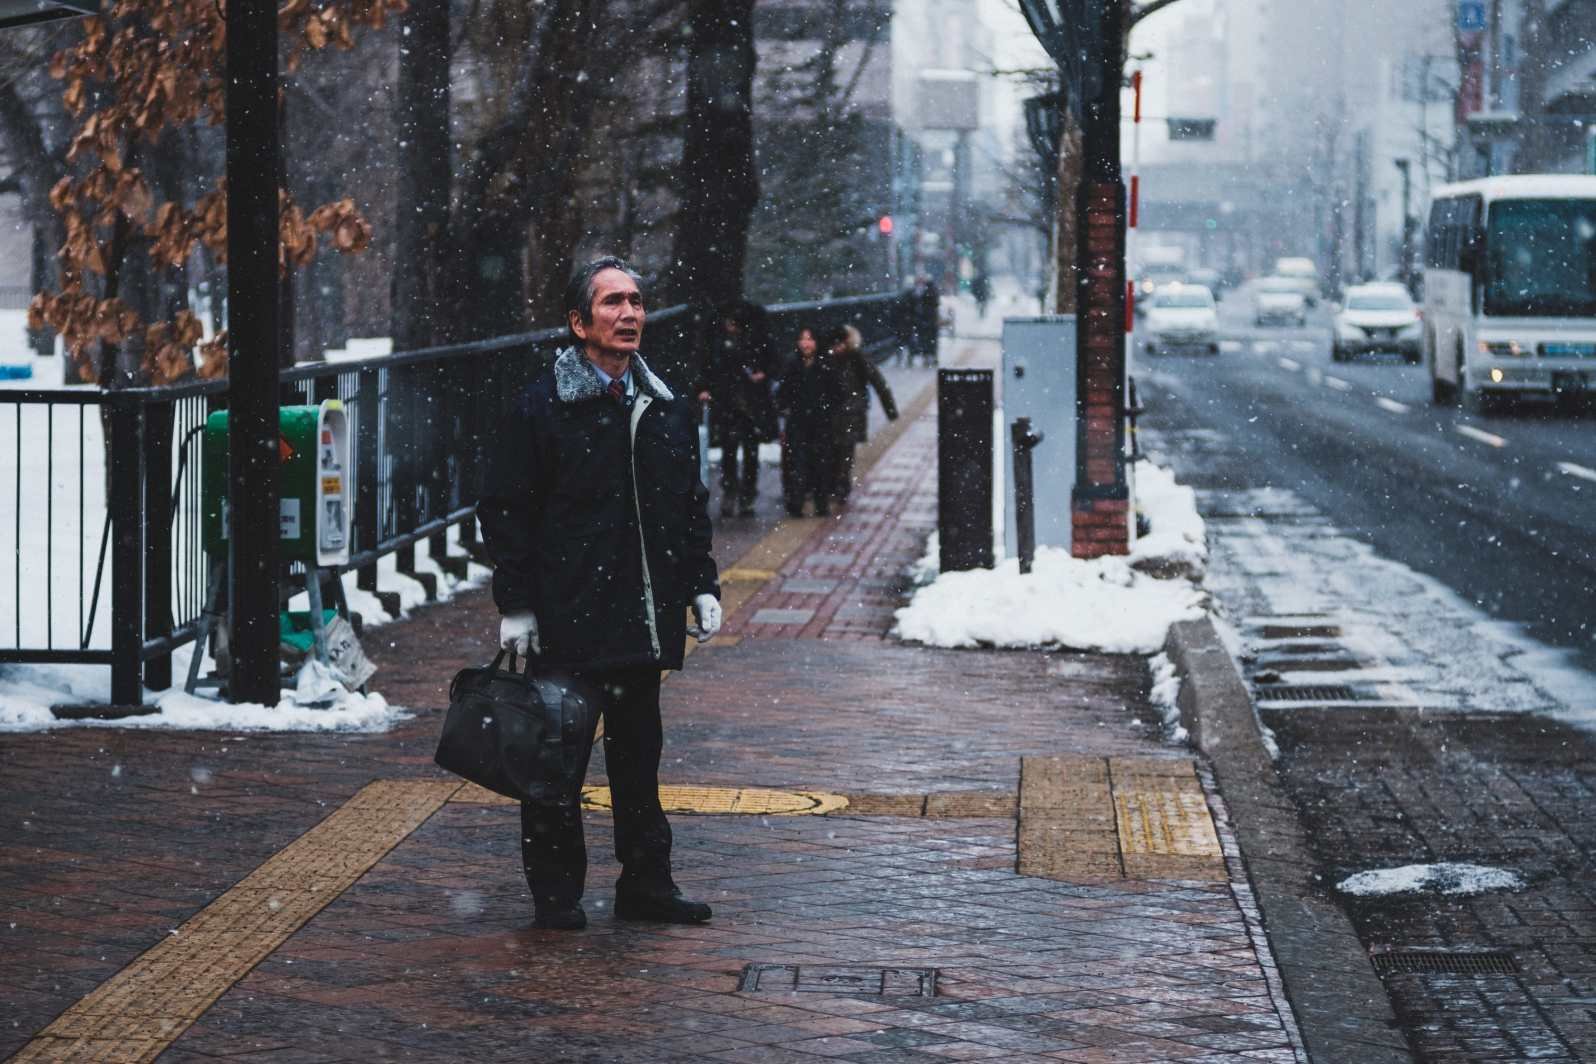 Snowing In Sapporo